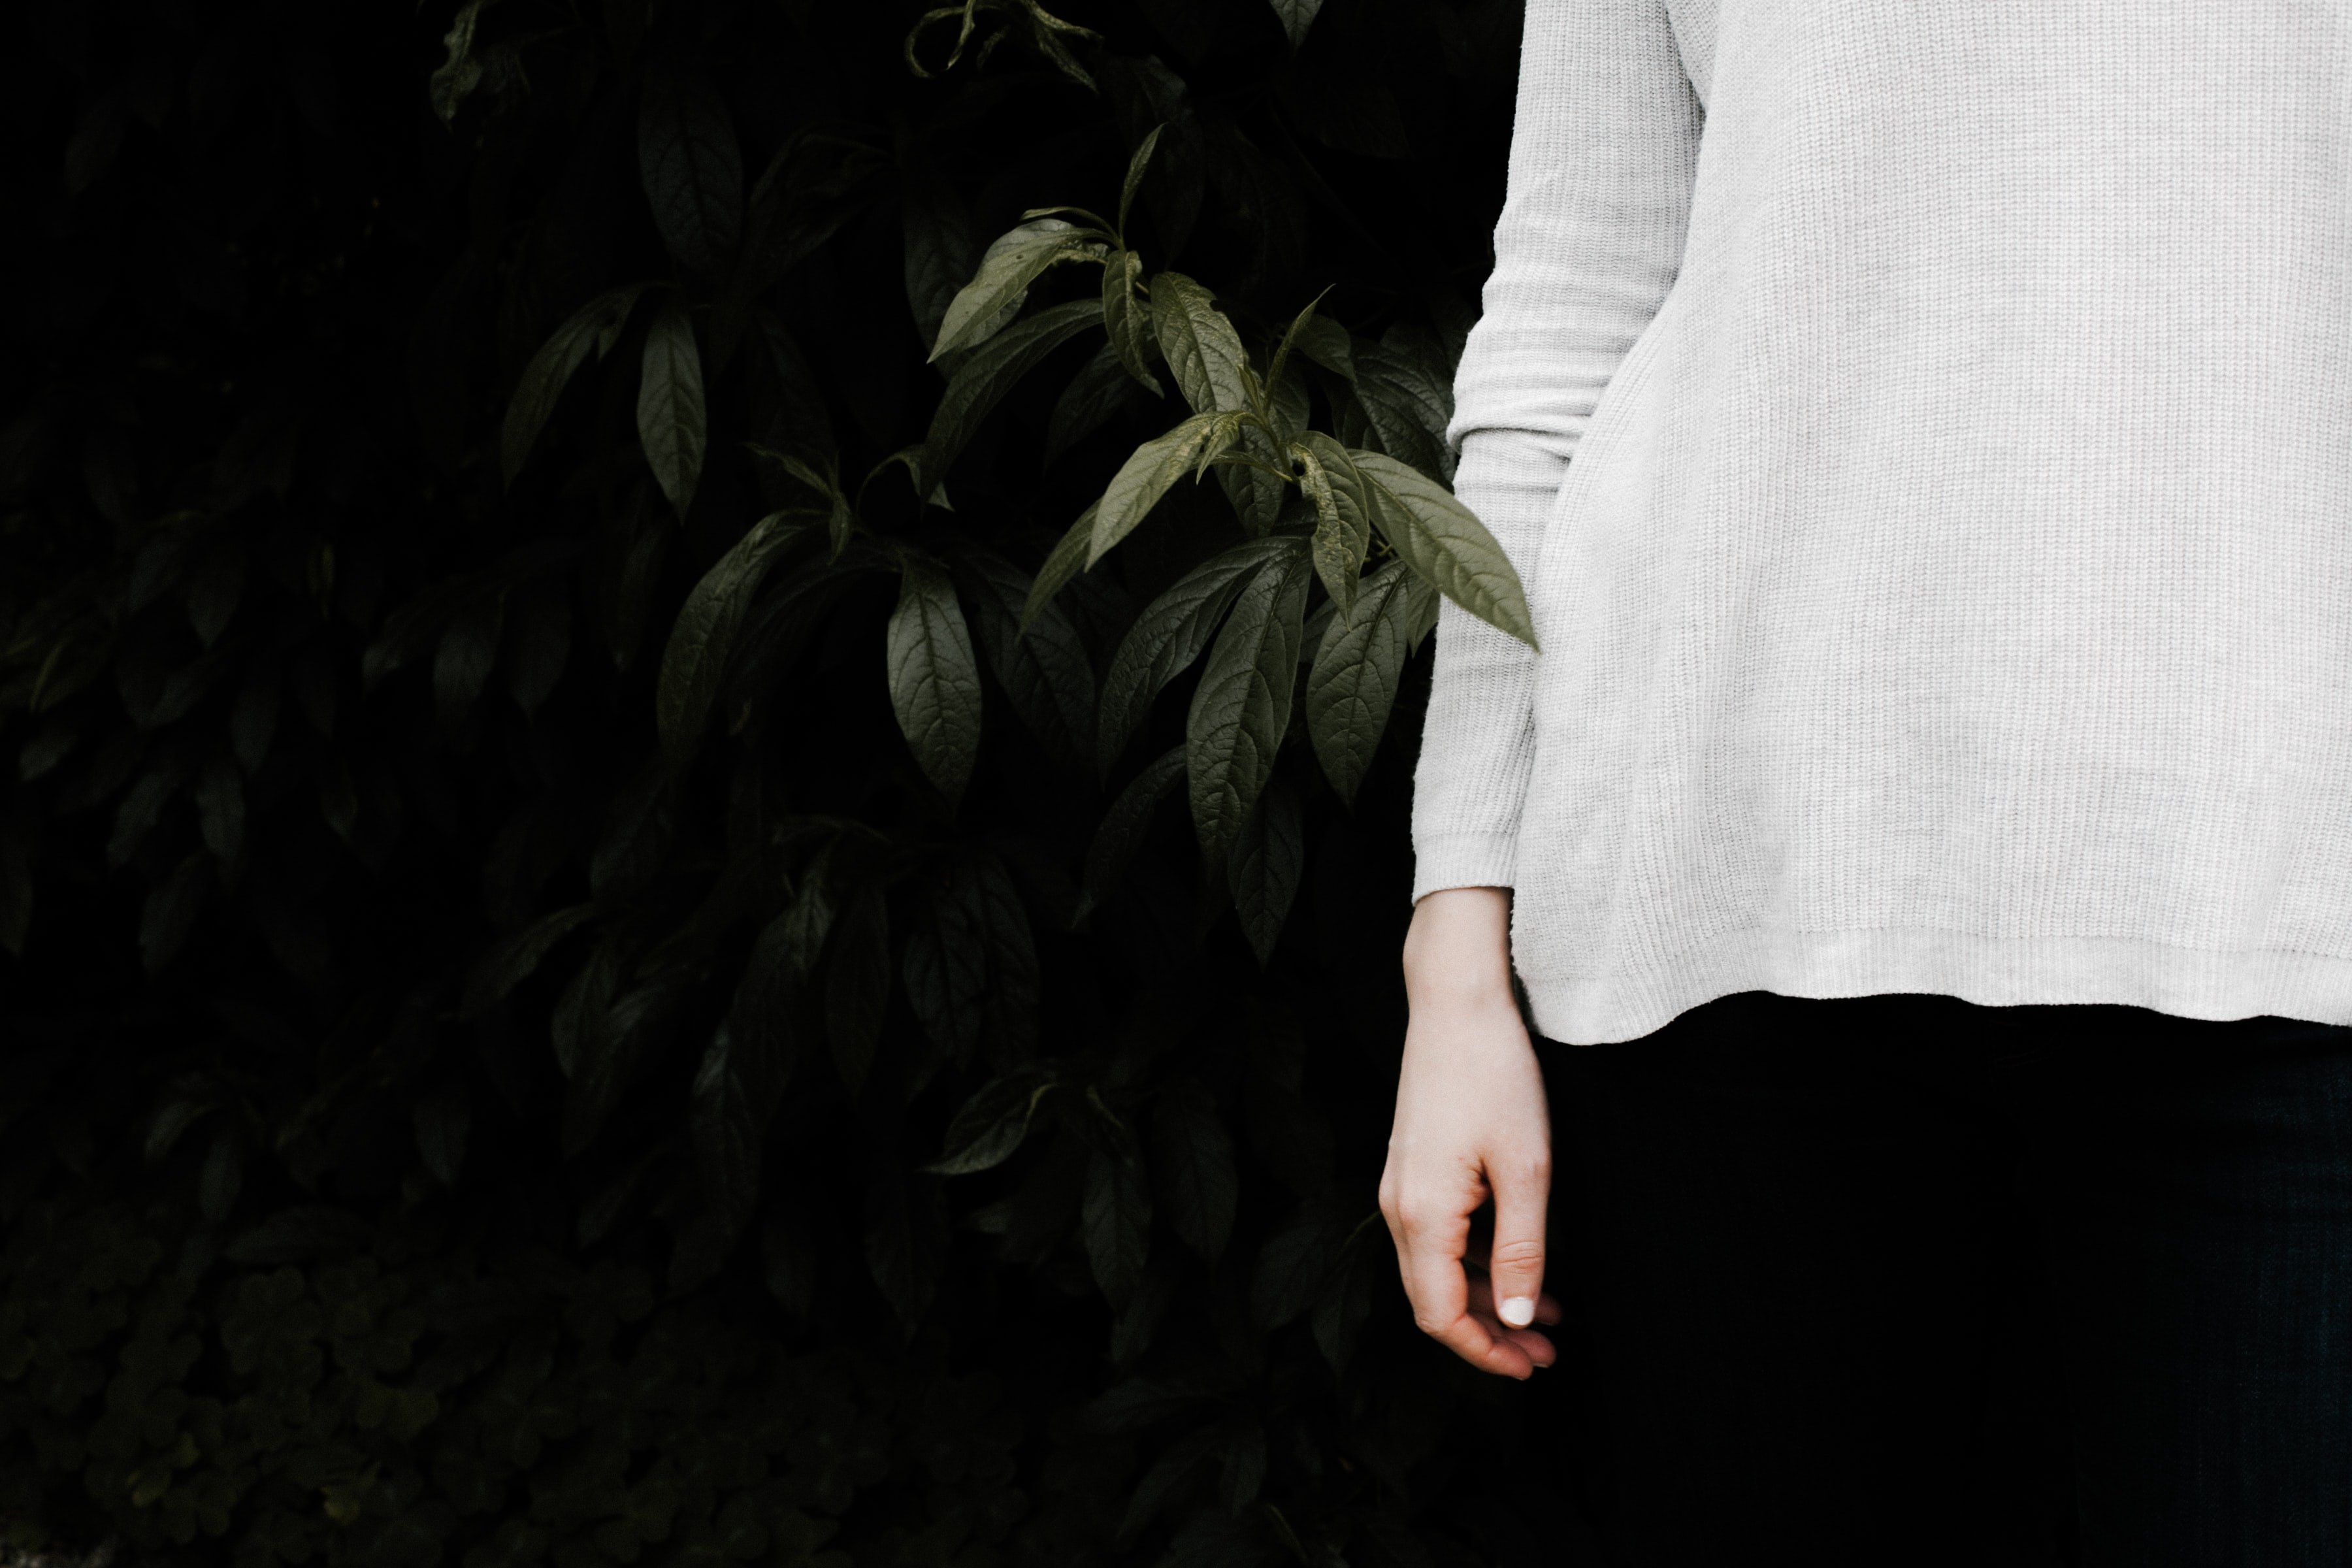 person wearing white long-sleeved shirt standing near green leaf bush